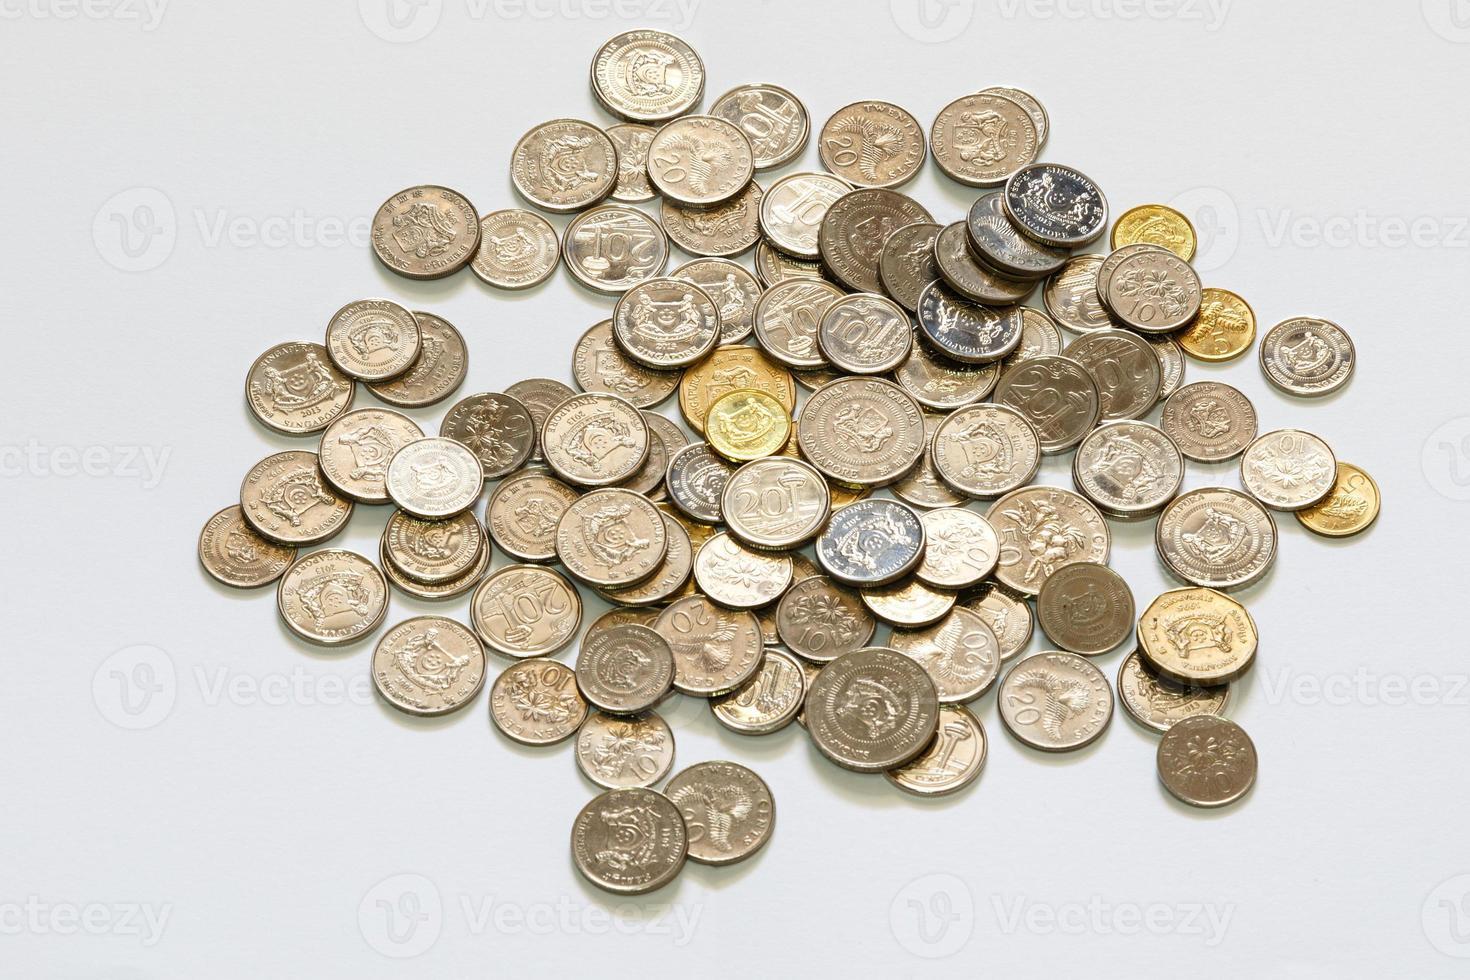 moneda de singapur foto